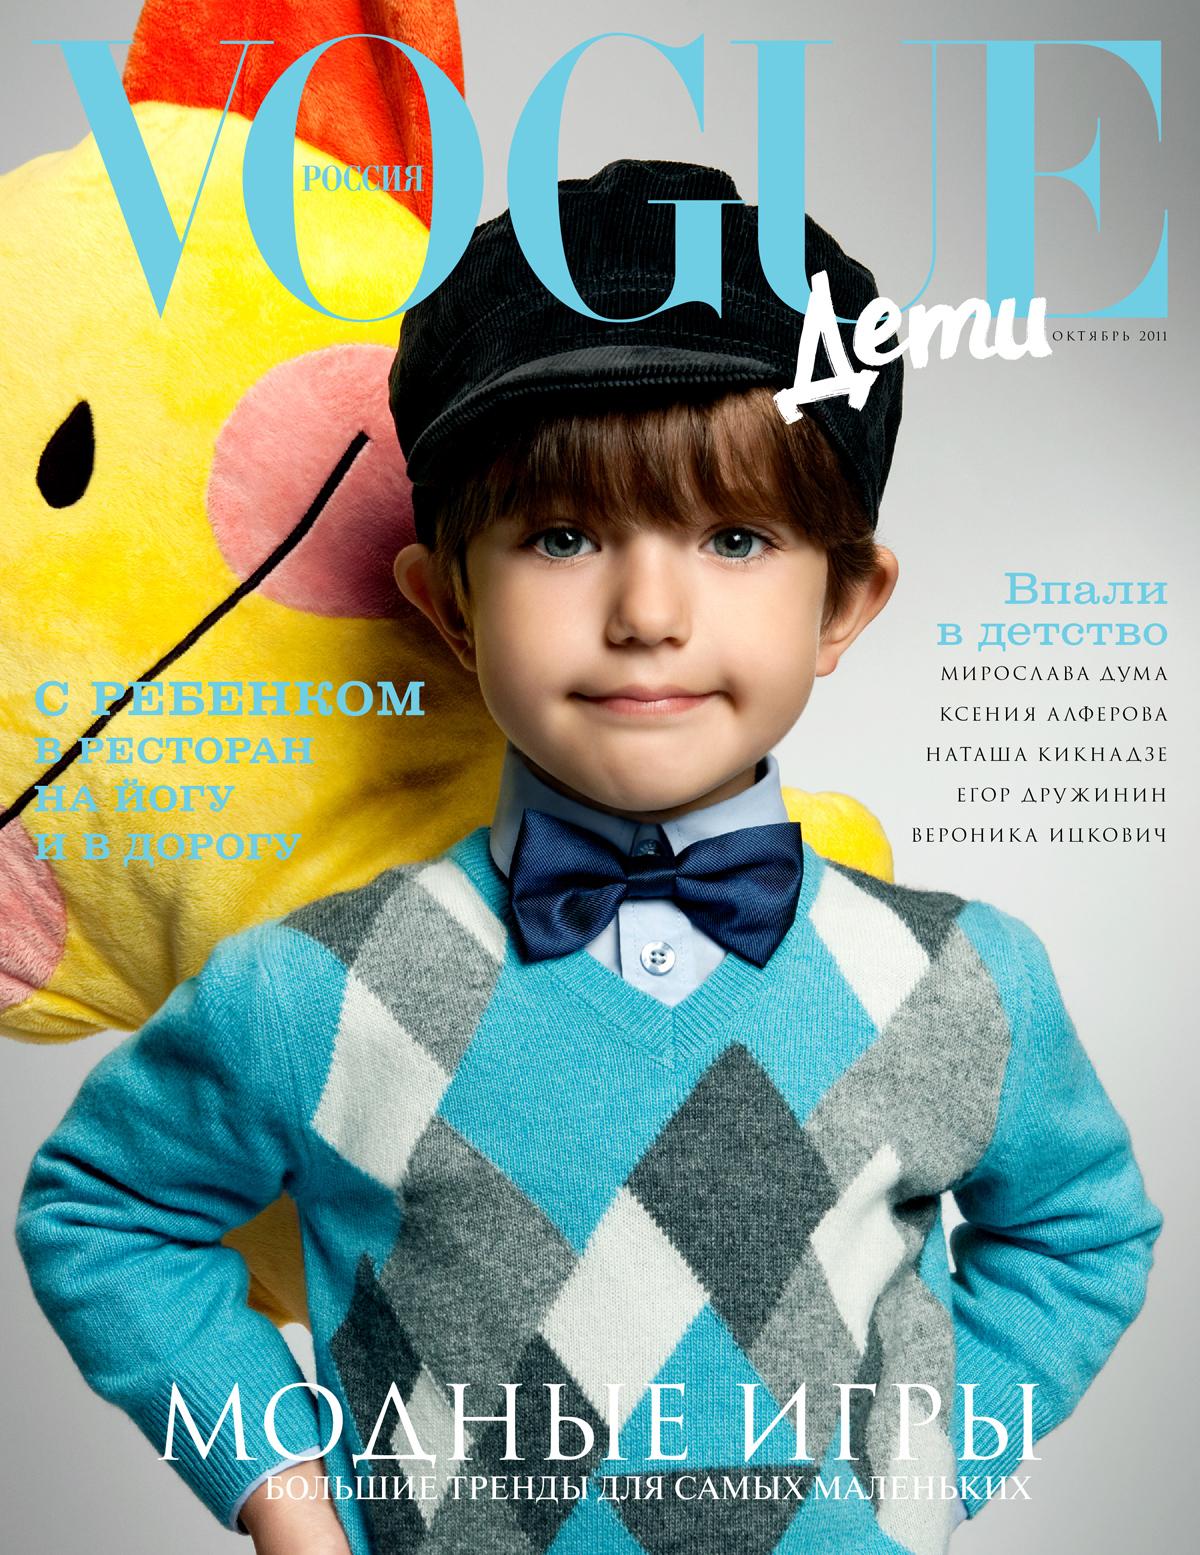 Фото реклама детей для журнала